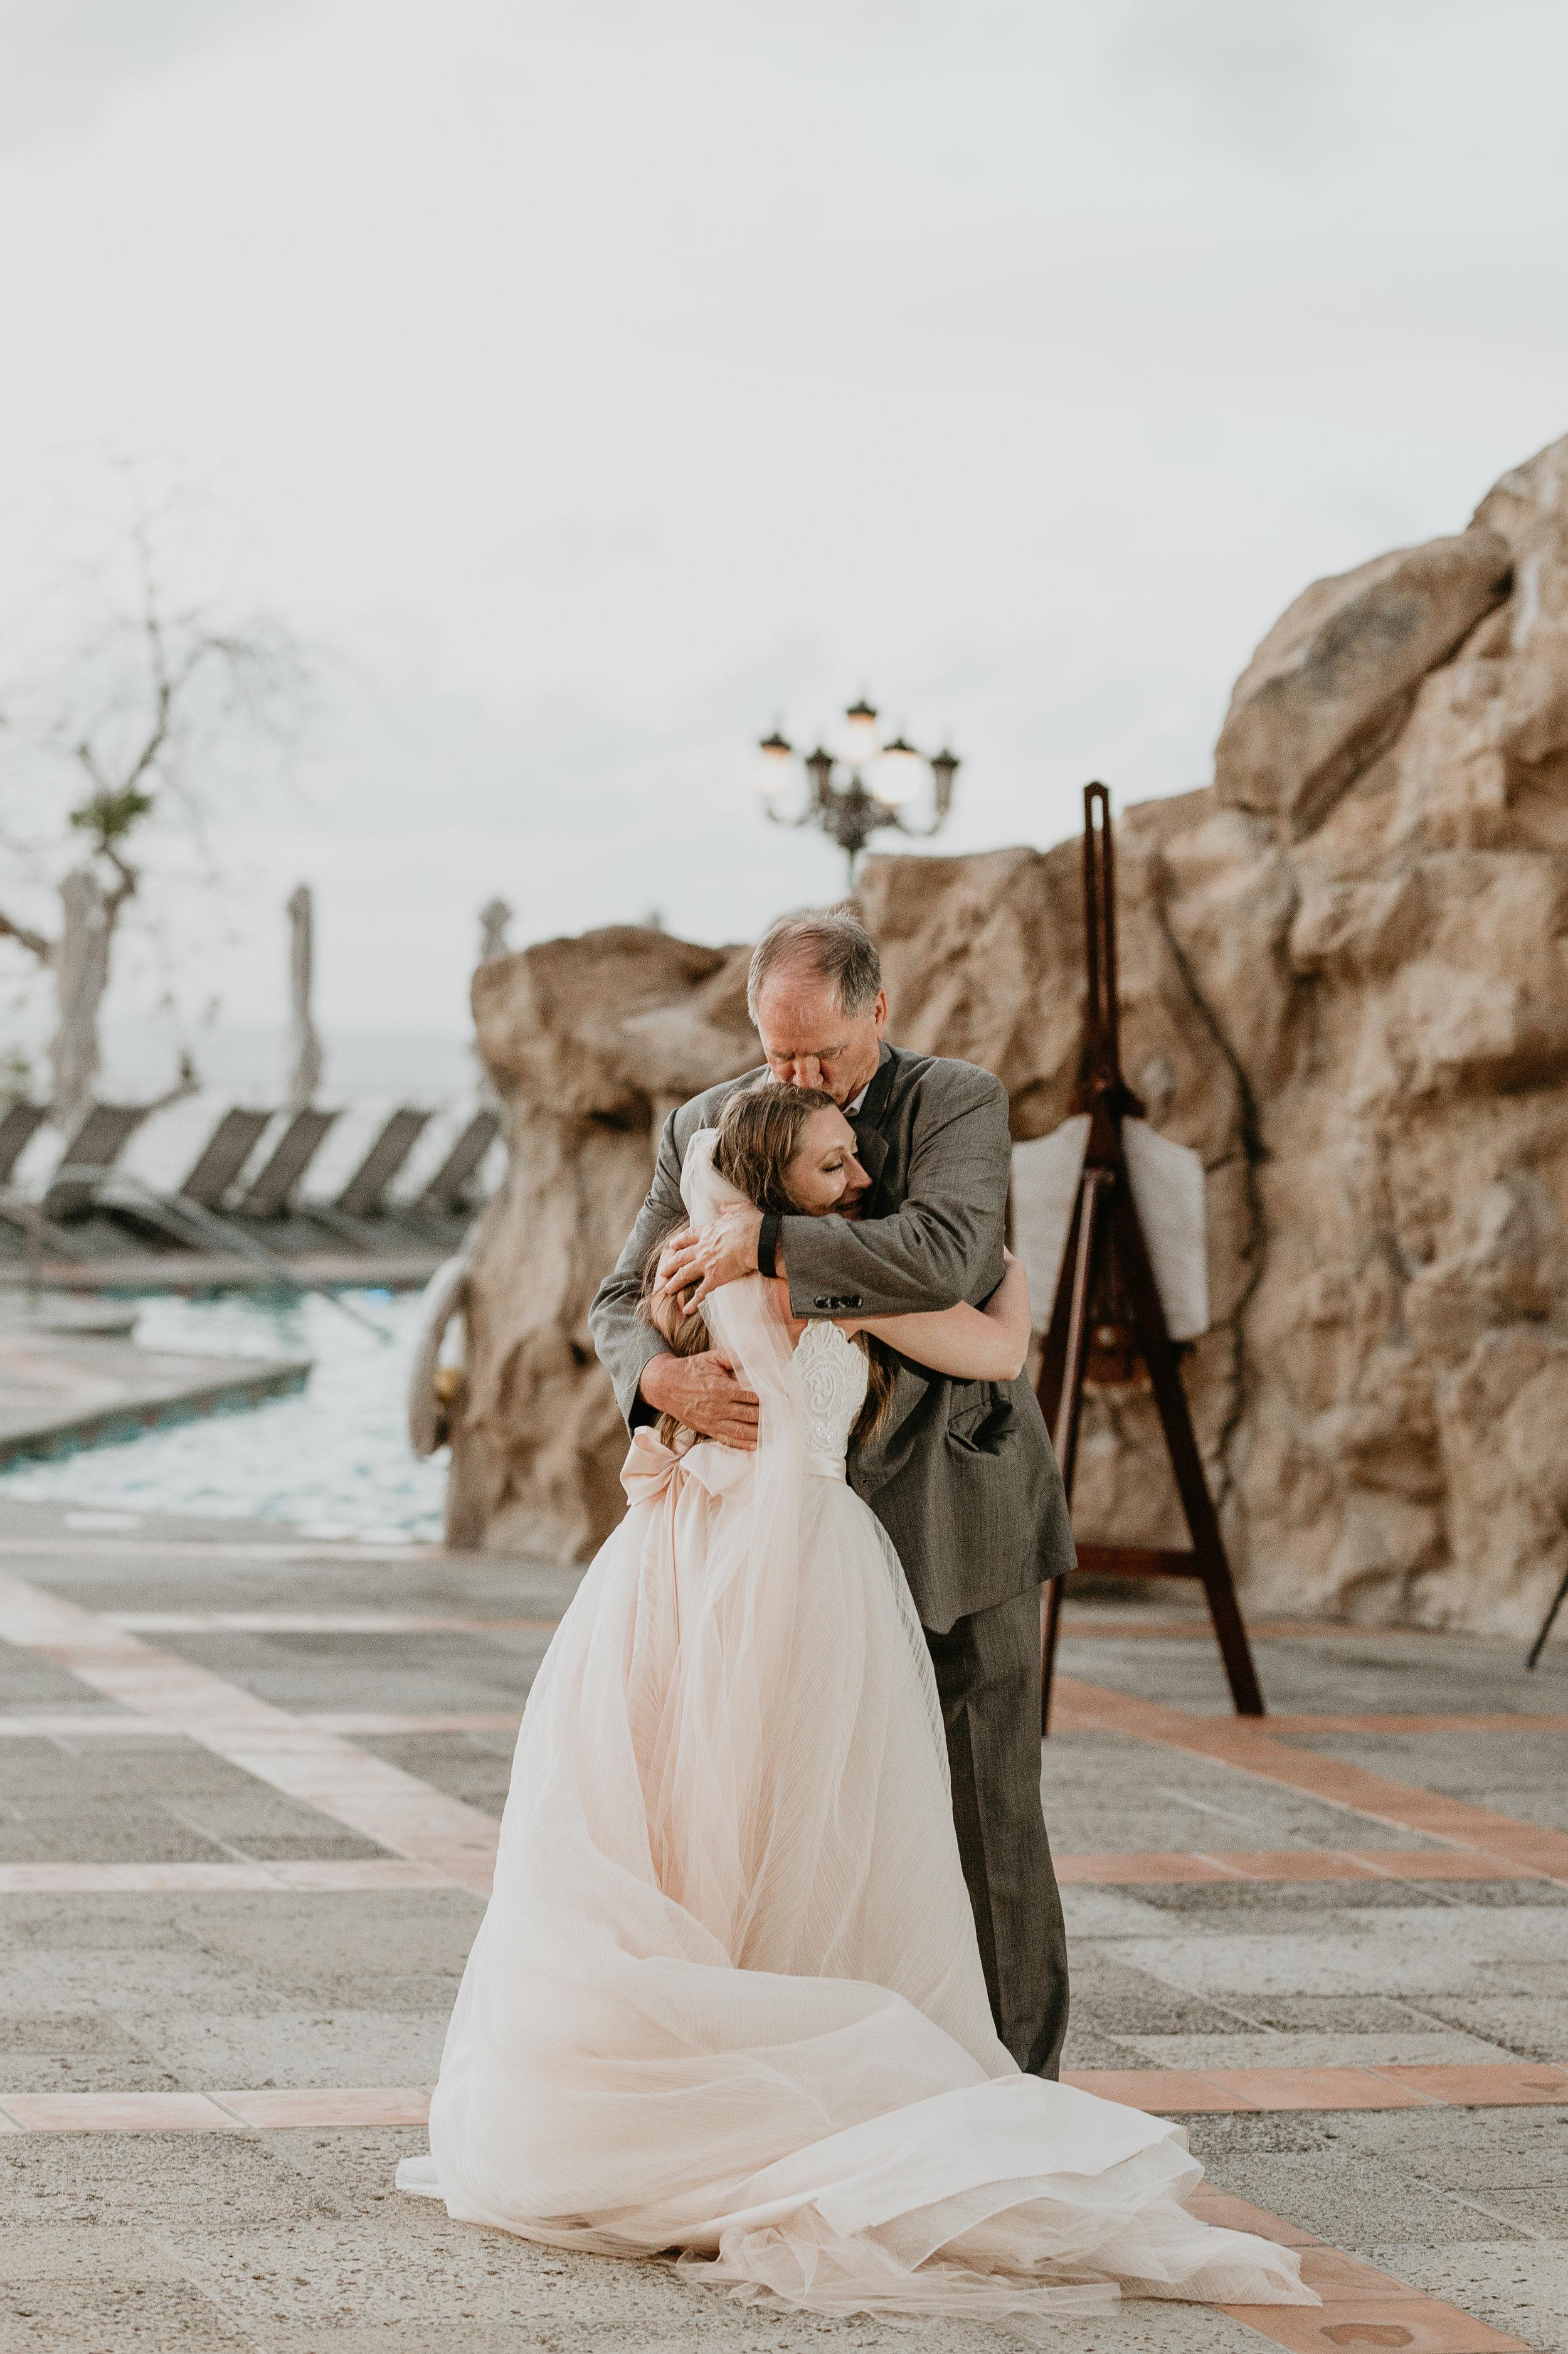 nicole-daacke-photography-destination-wedding-in-st-lucia-sandals-la-toc-intimate-island-wedding-carribean-elopement-photographer-chill-island-wedding-141.jpg